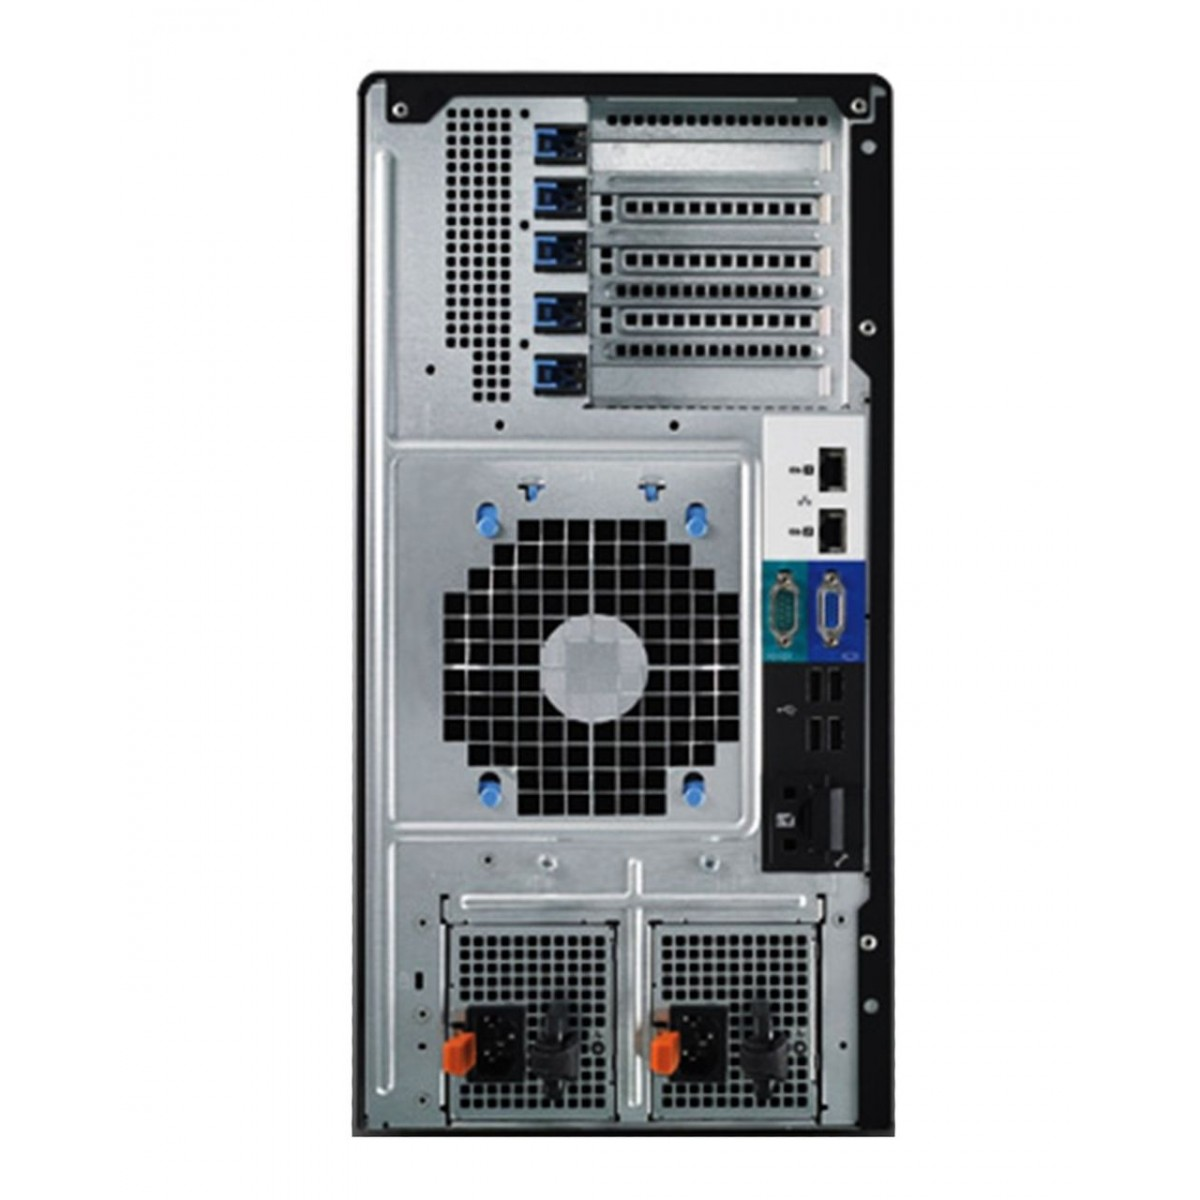 IBM ServeRAID MR10i 256MB SAS8708E +BATTERY